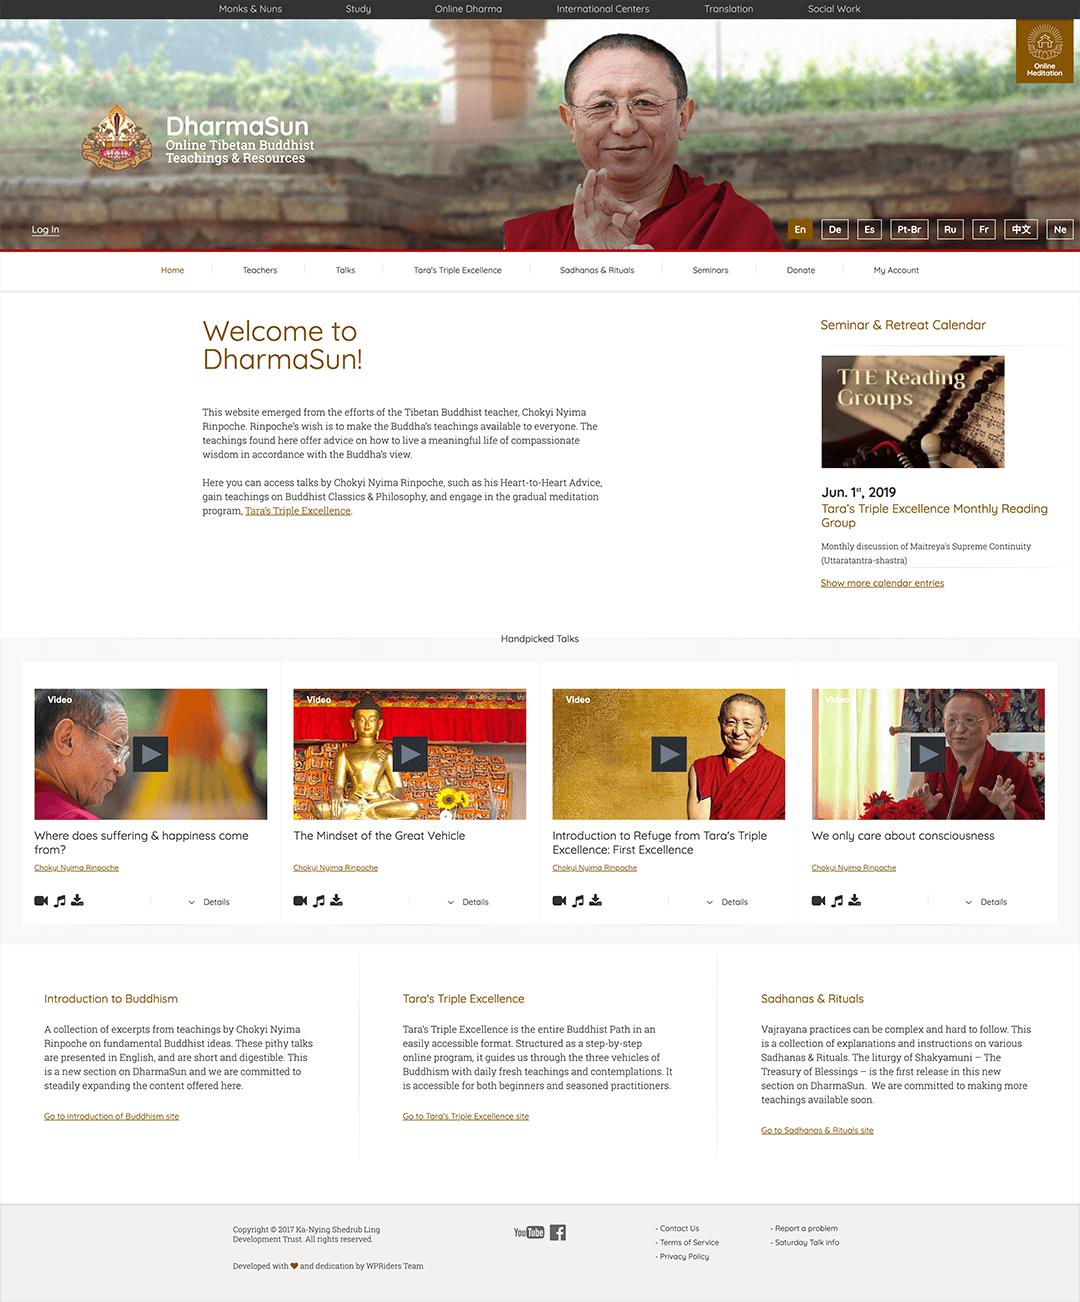 dharmasun.org